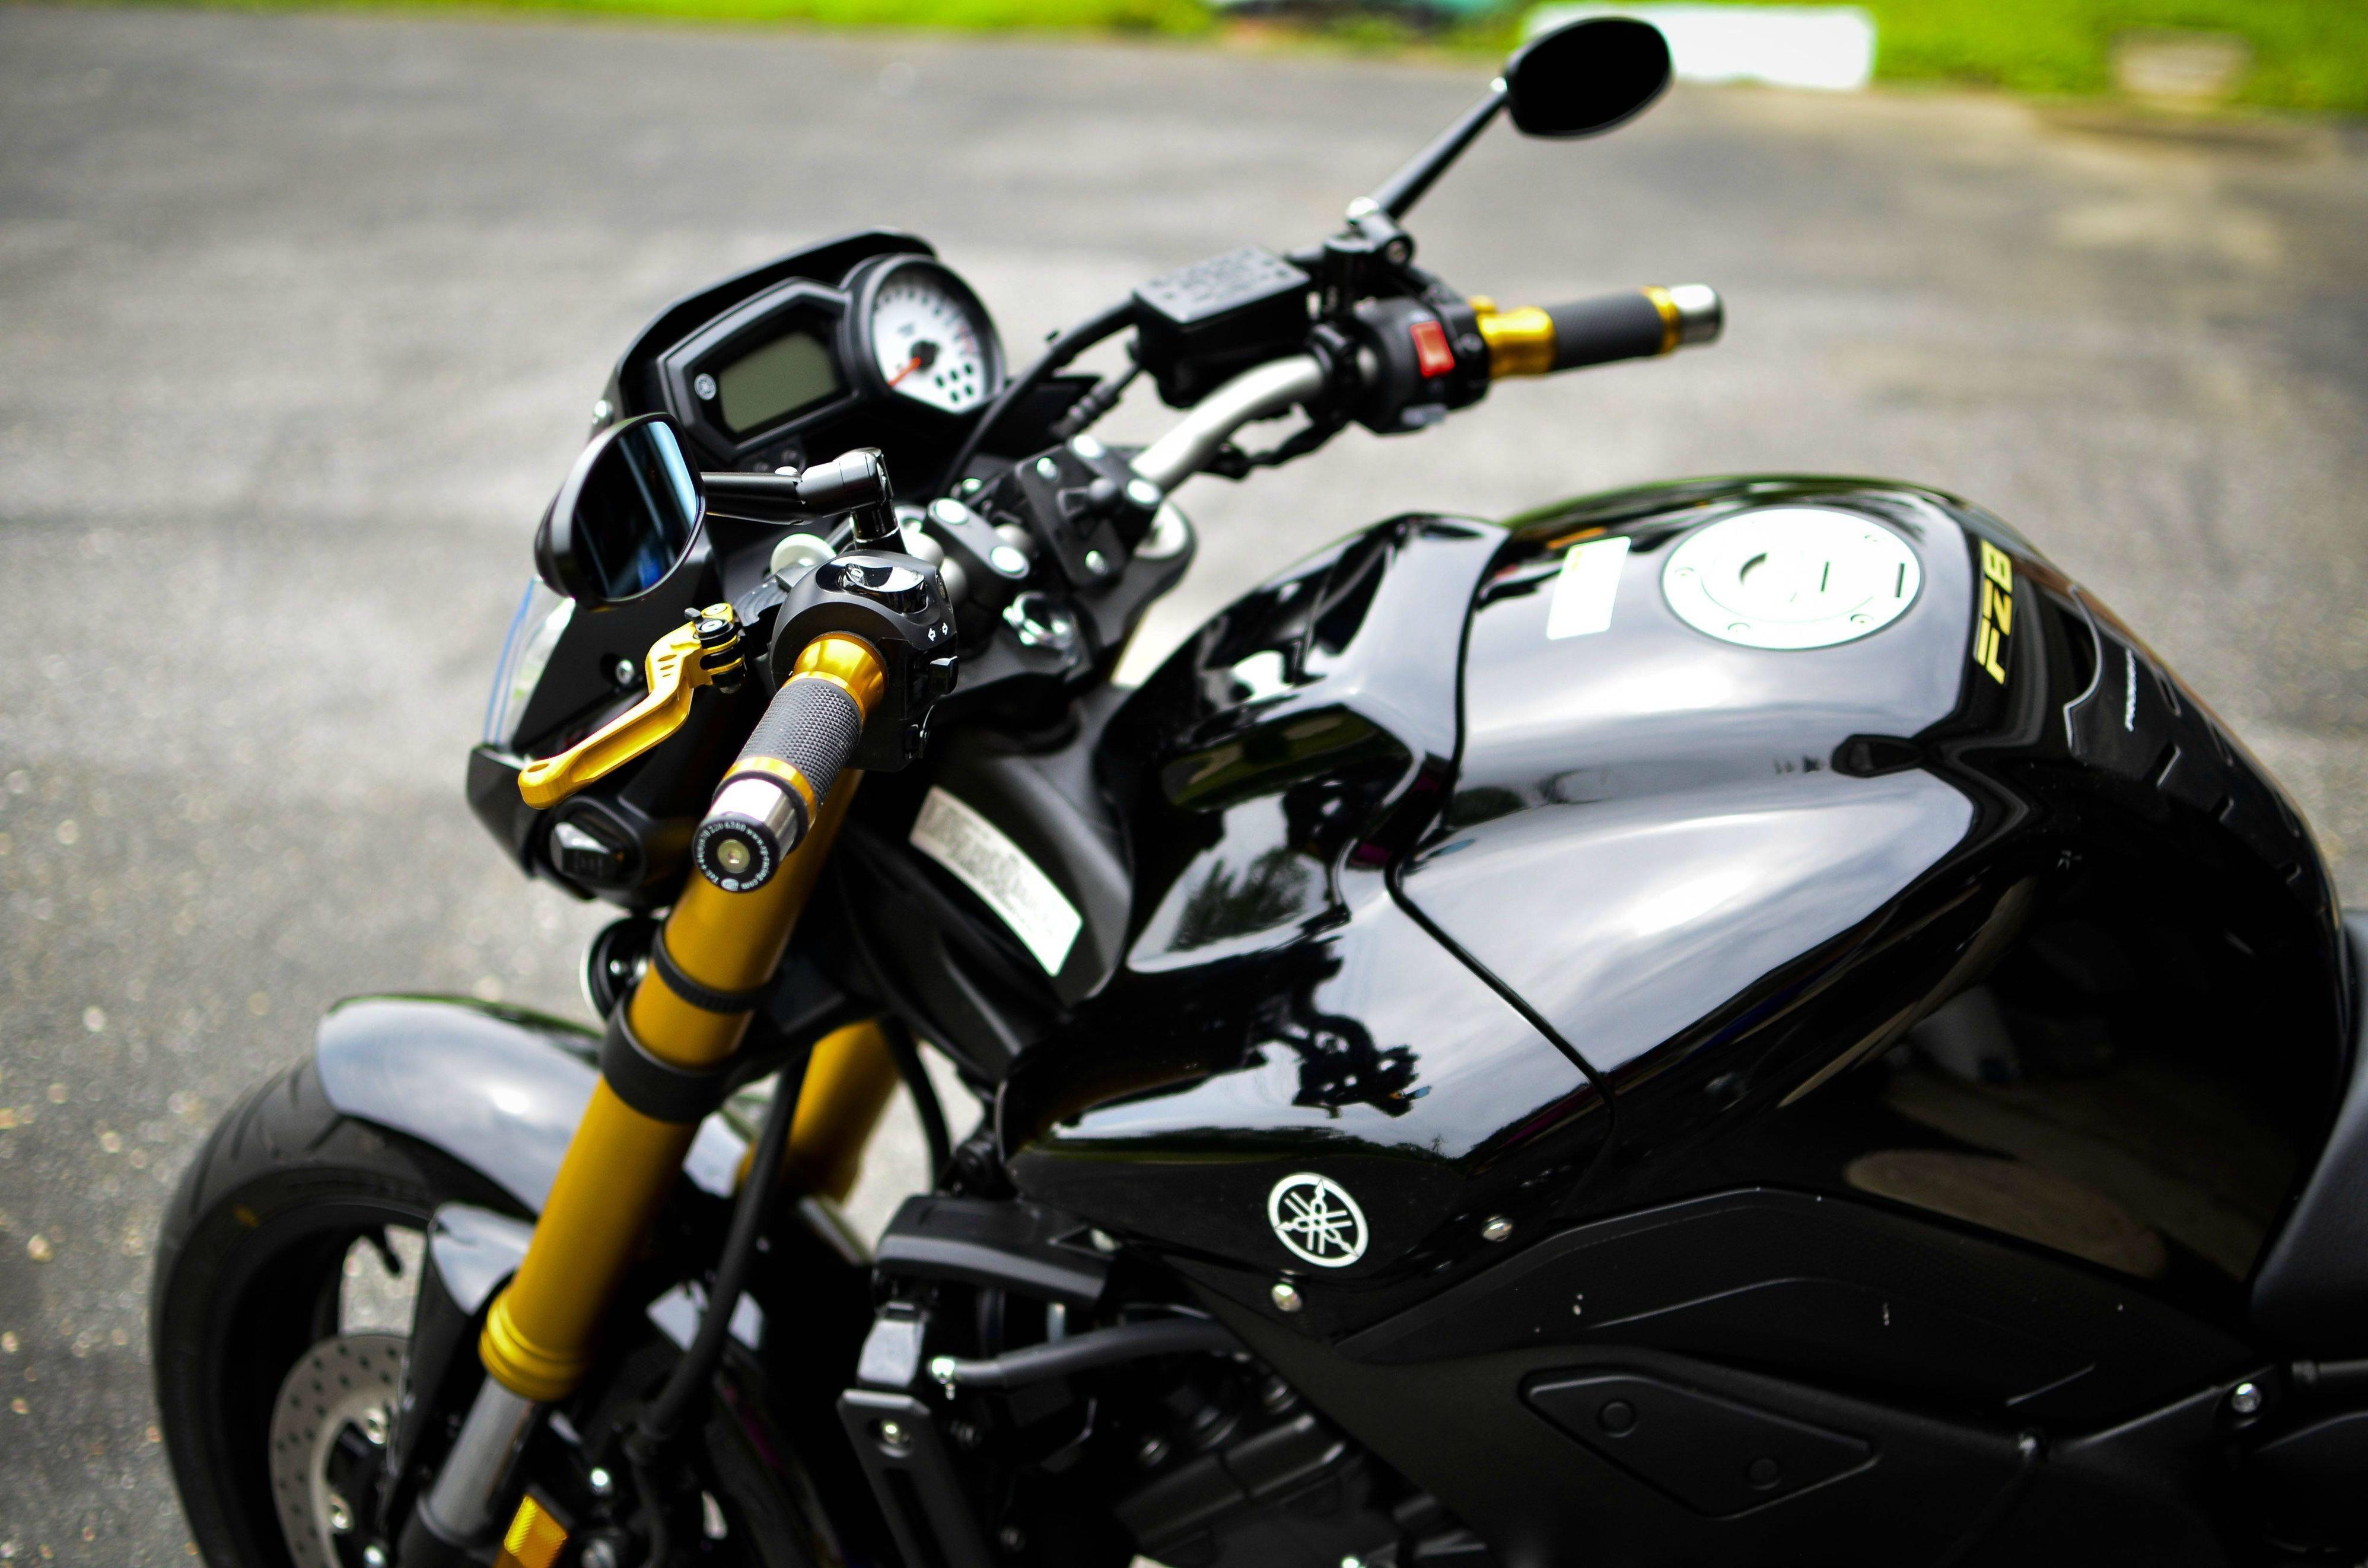 Yamaha FZ8 Love the gold and black! Xj6